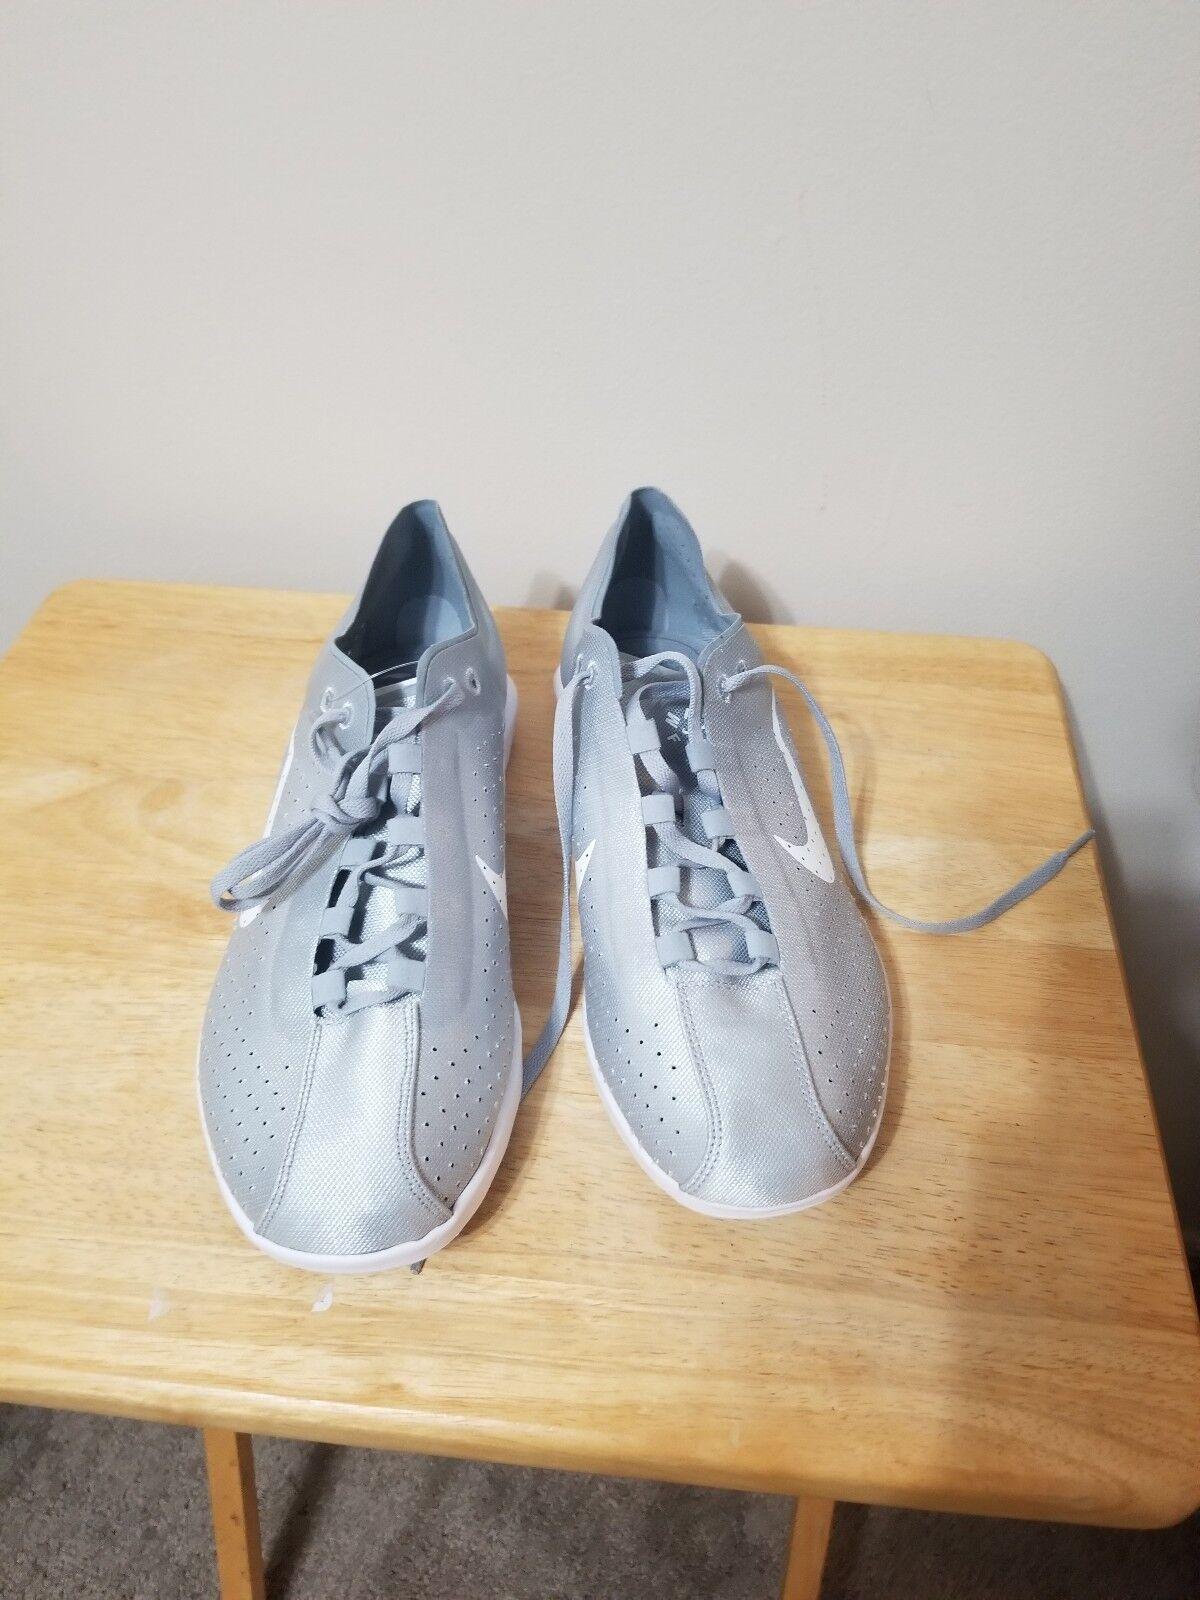 nike mens libellula scarpa da corsa, lupo grigio 898027-001       Sconto    Stravagante    Moda moderna ed elegante    Scolaro/Signora Scarpa  9c2821